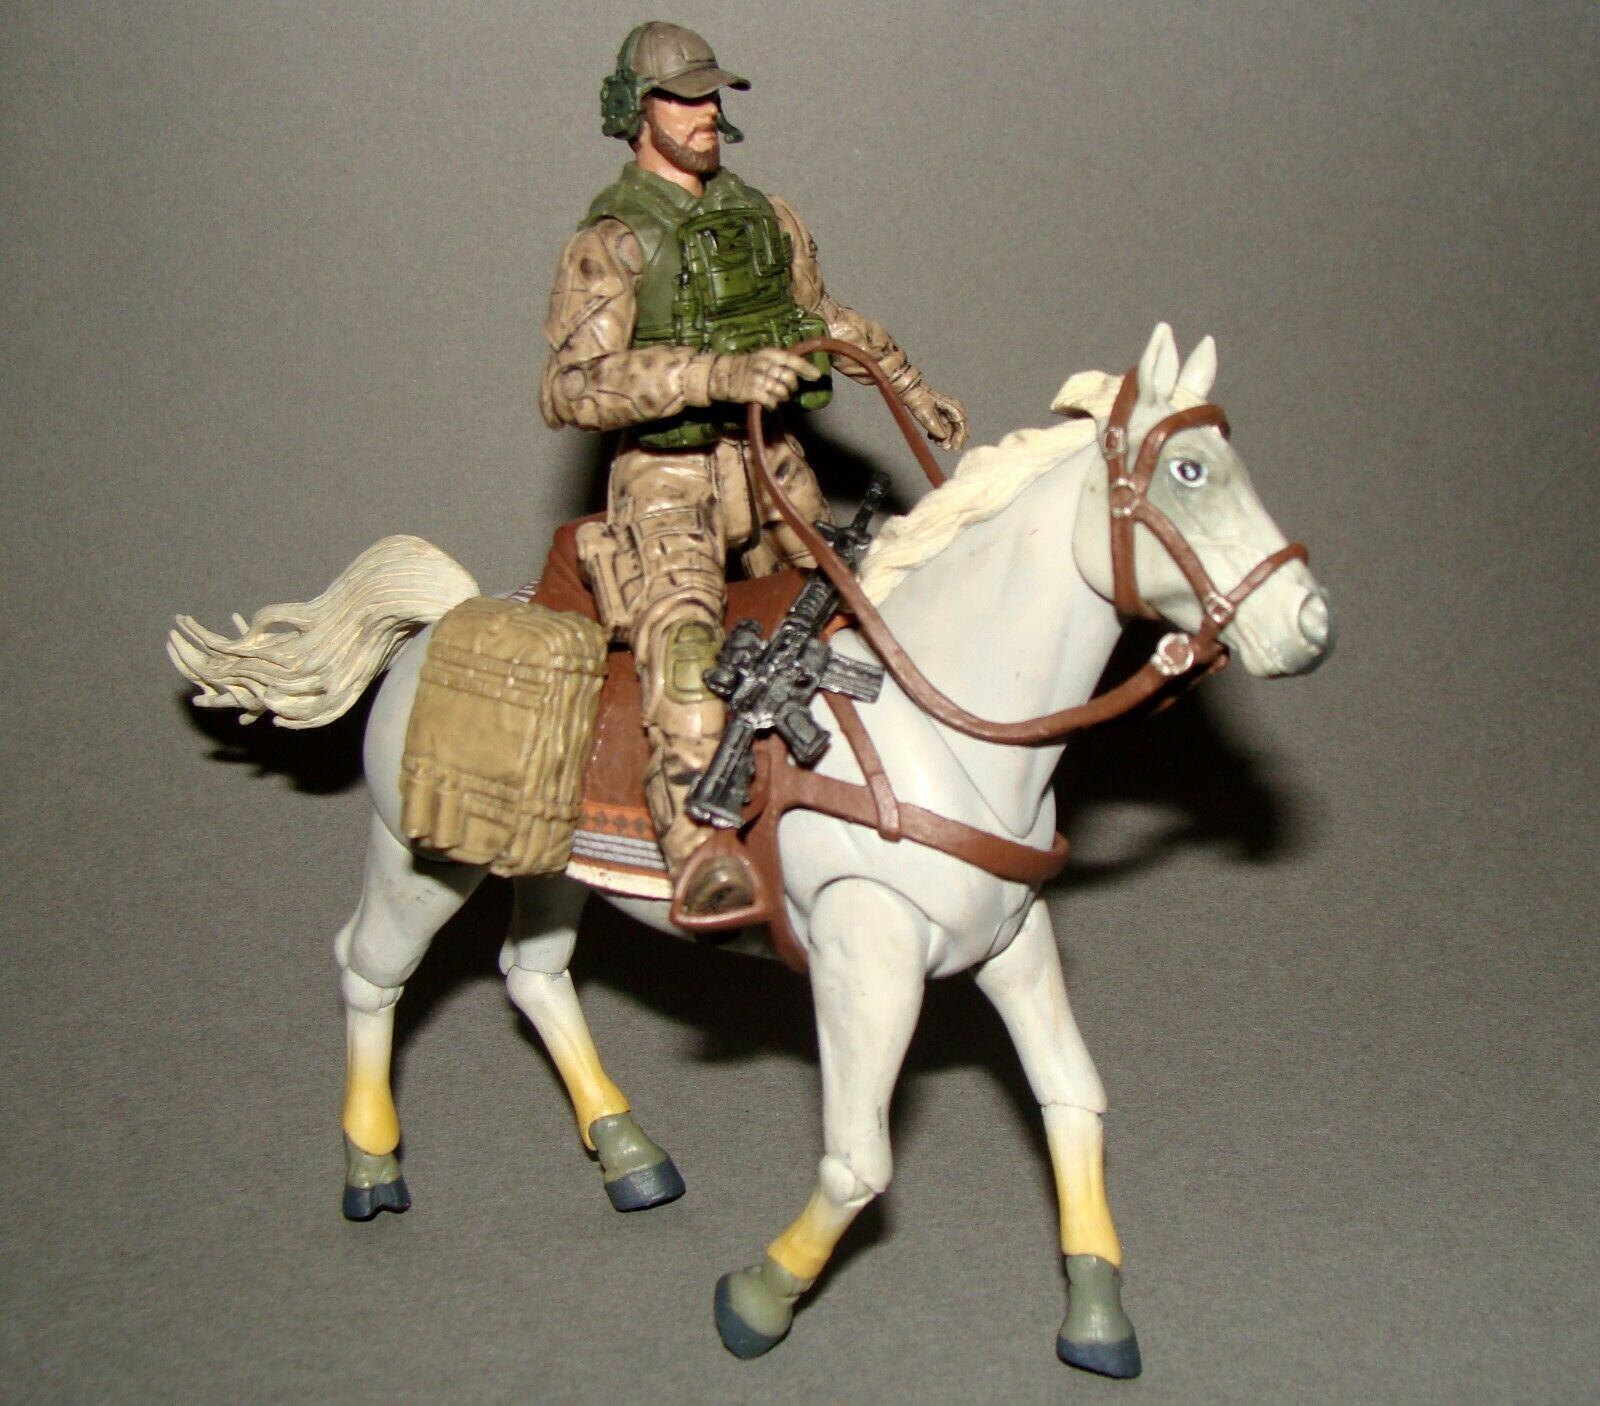 1 18 Bbi Elite Force EE. UU. Special Ops Afganistán 2001 Figura de caballo de vuelta Rider